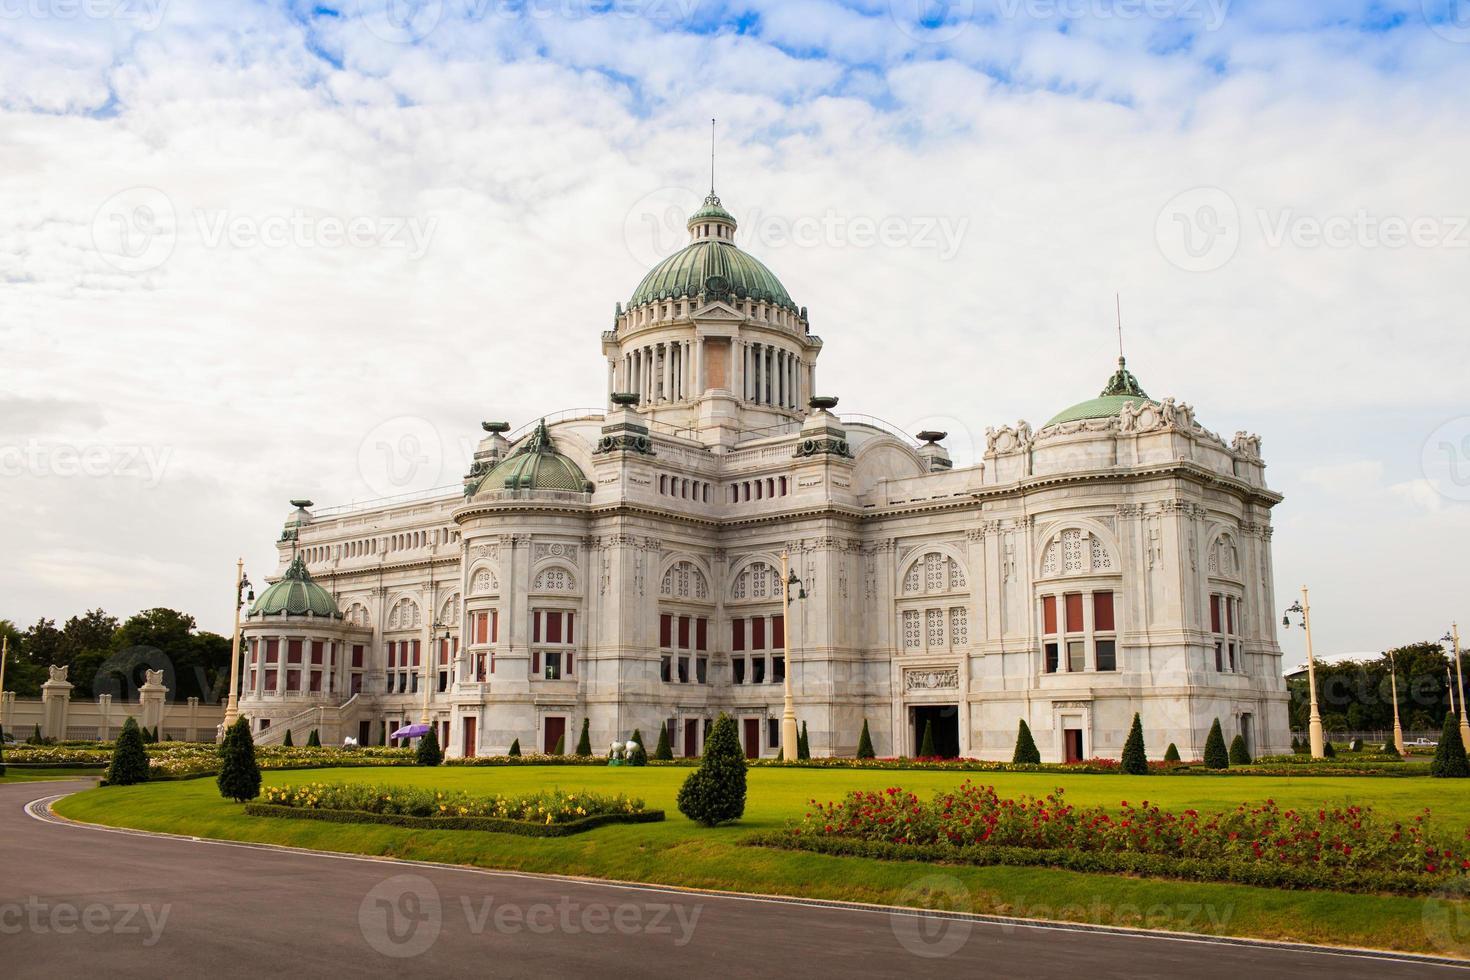 Bangkok, Thaïlande, 2020 - Salle du trône Ananta Samakhom pendant la journée photo